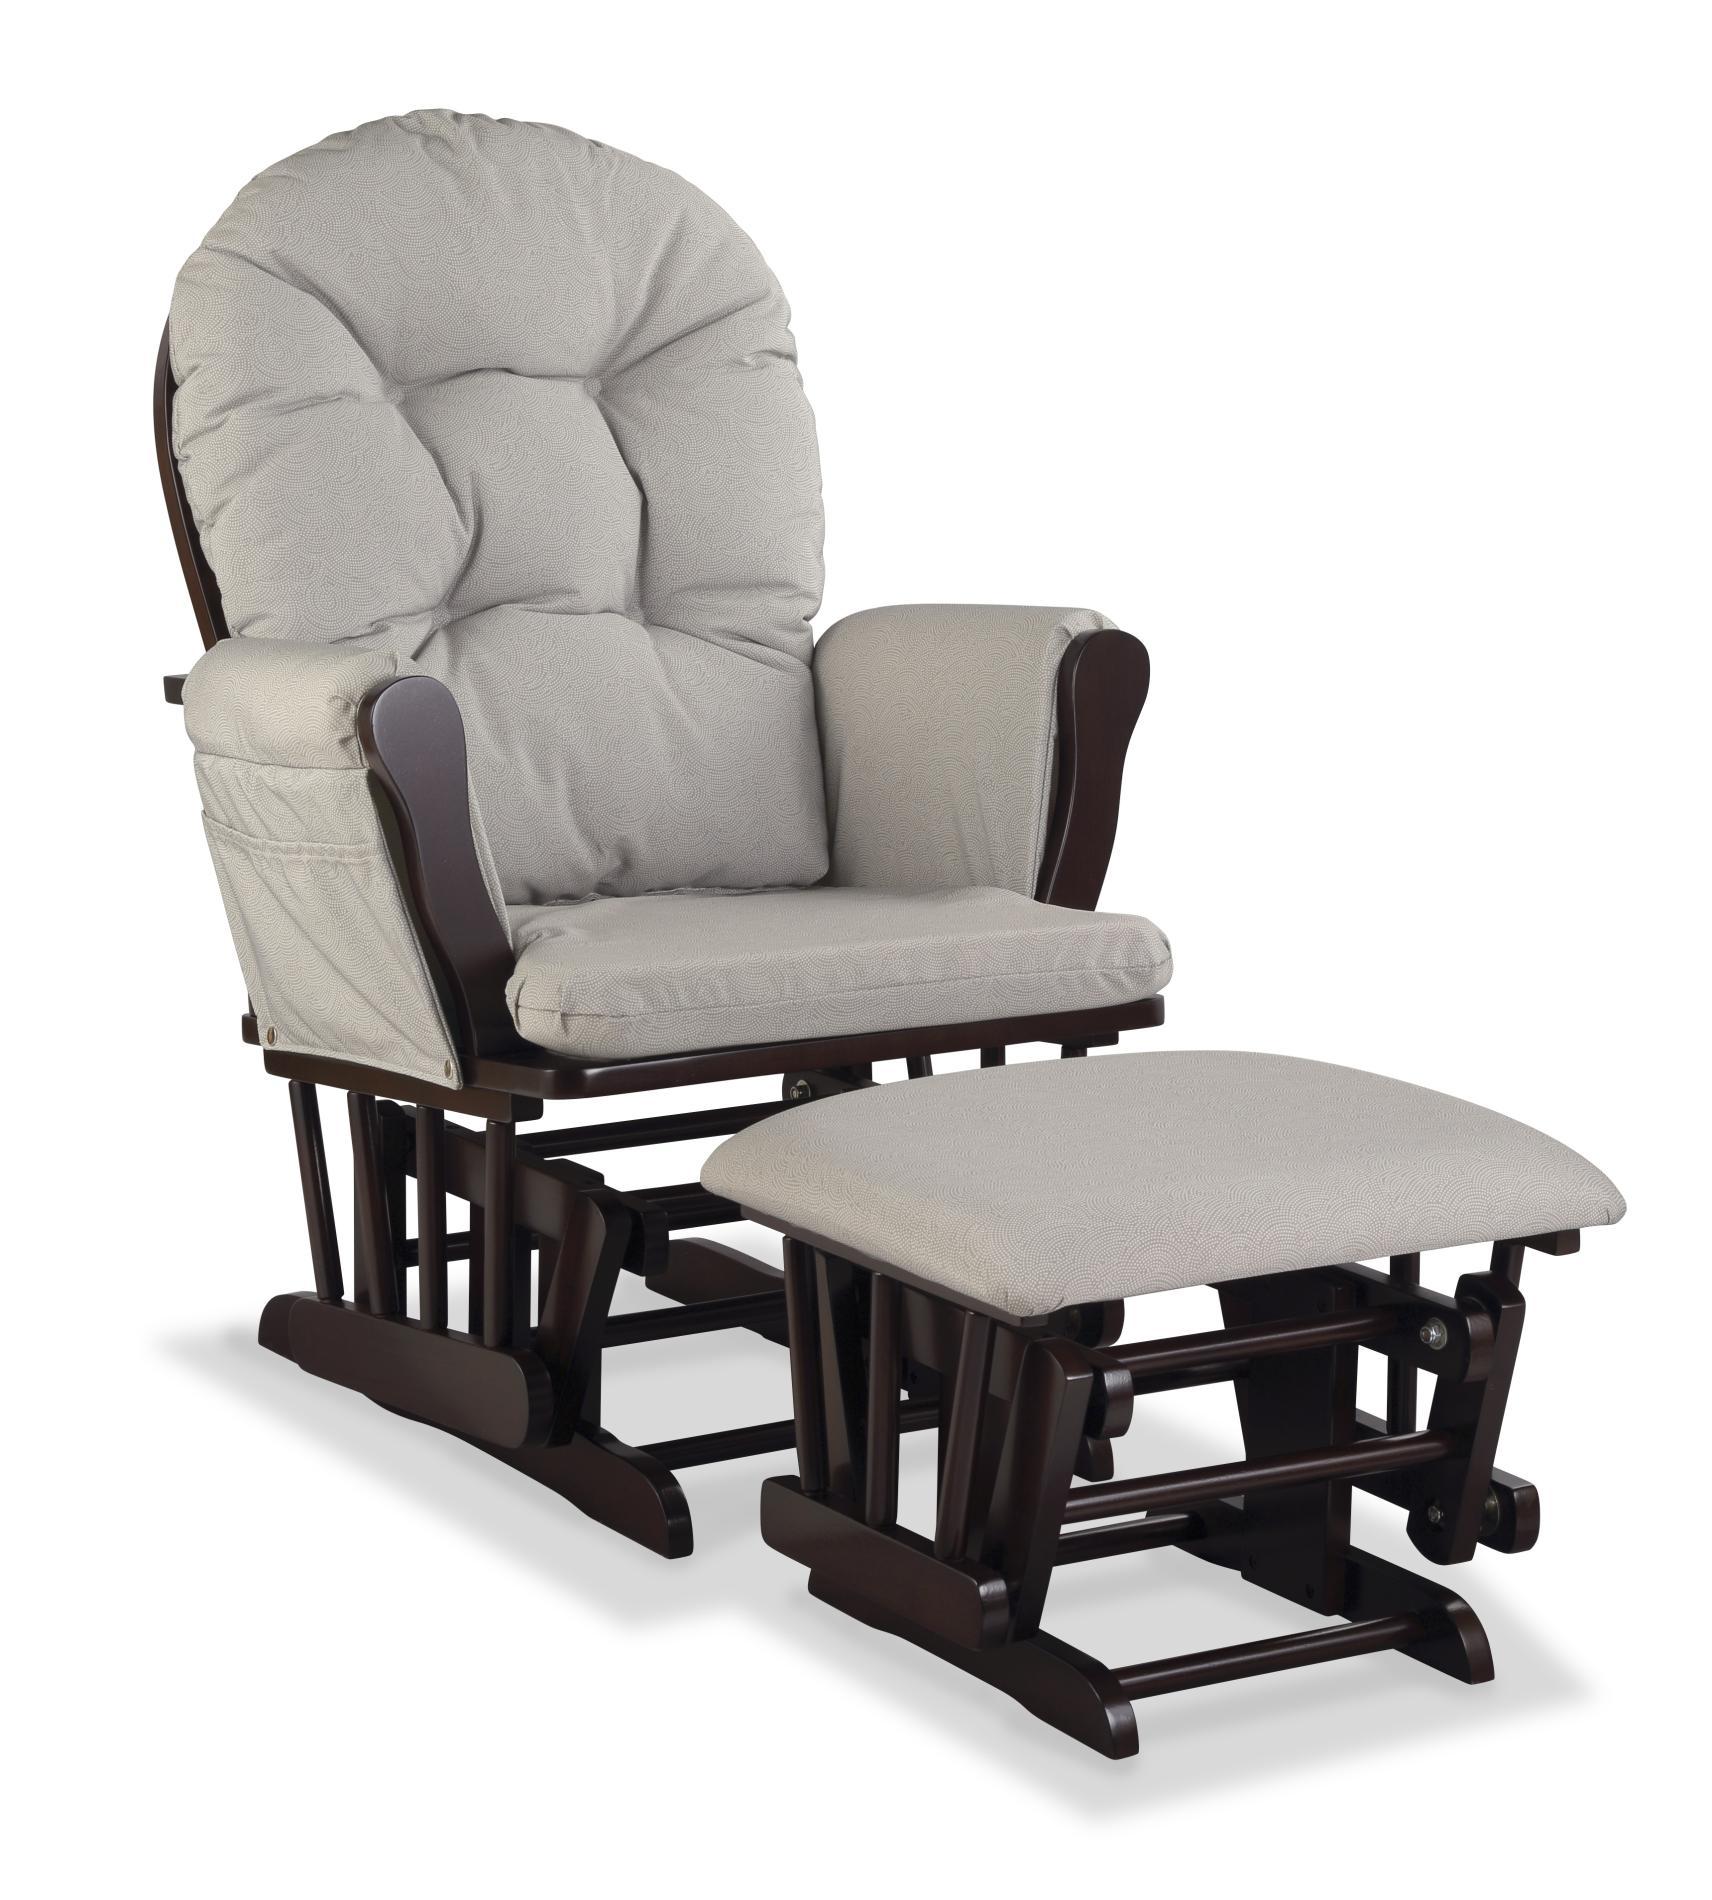 graco nursery glider chair u0026 ottoman - baby - baby furniture - gliders JEPTMPO